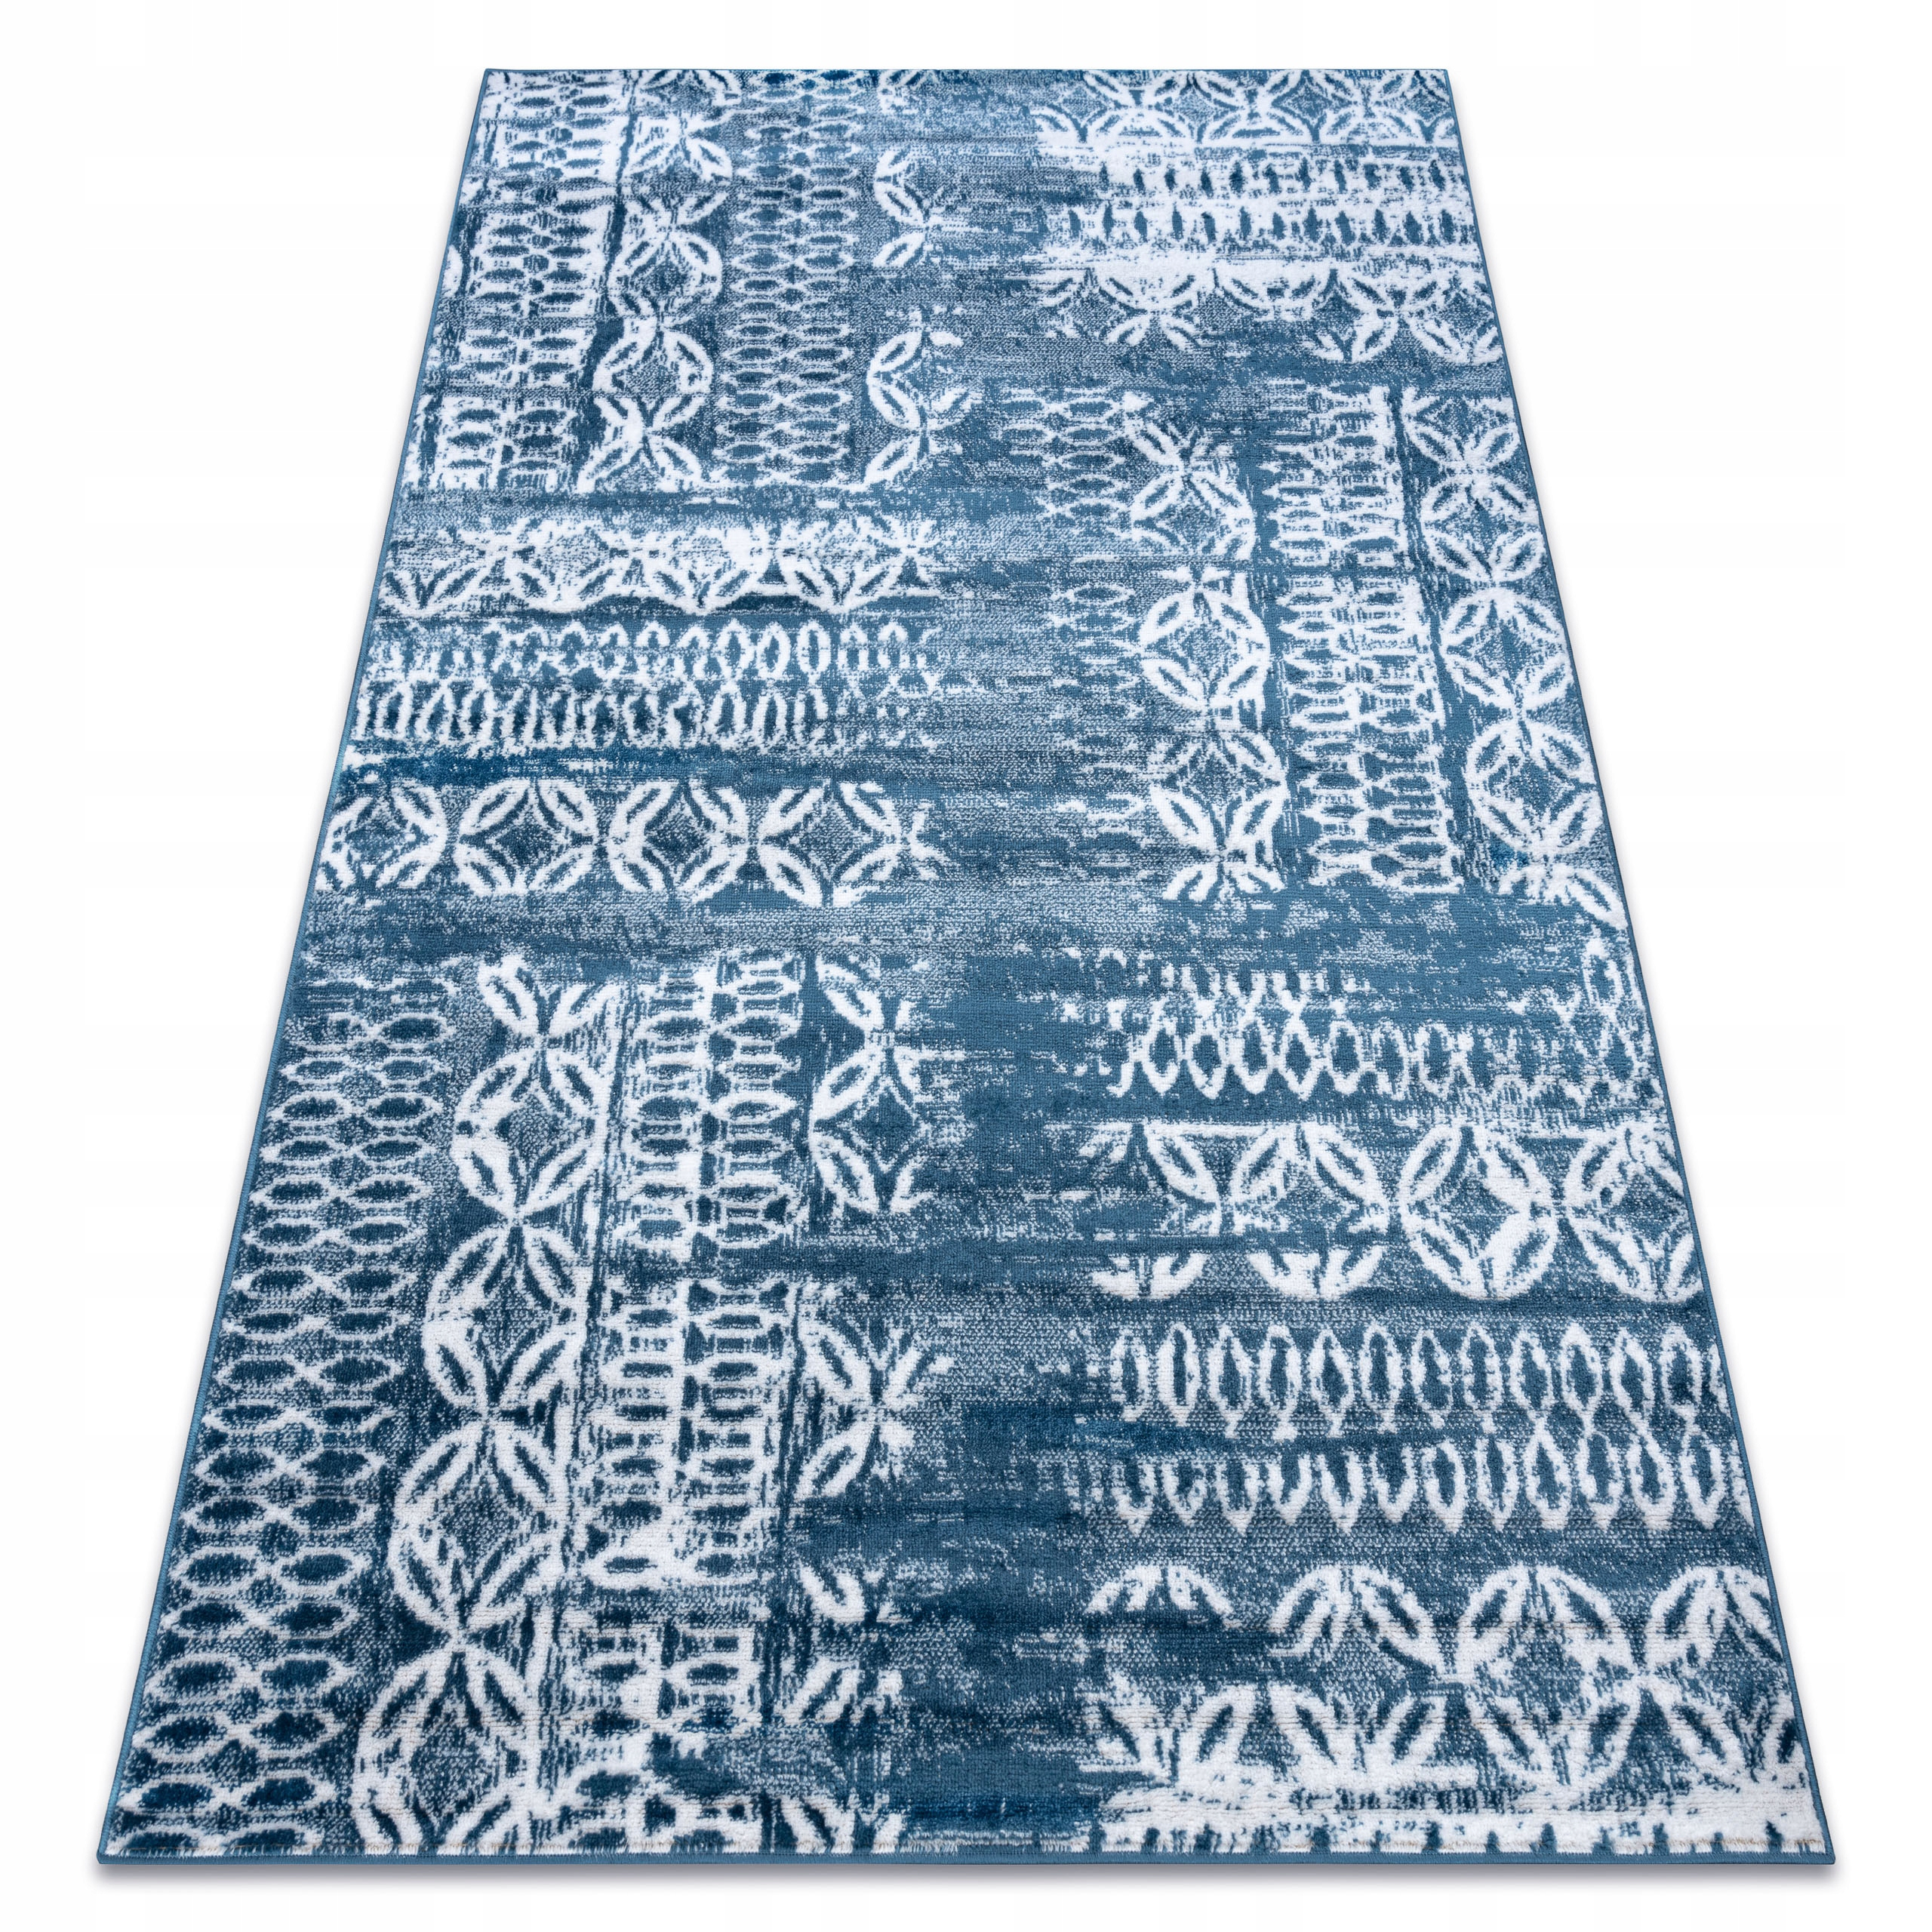 KOBEREC 200x290 RETRO VINTAGE blue #GR3447